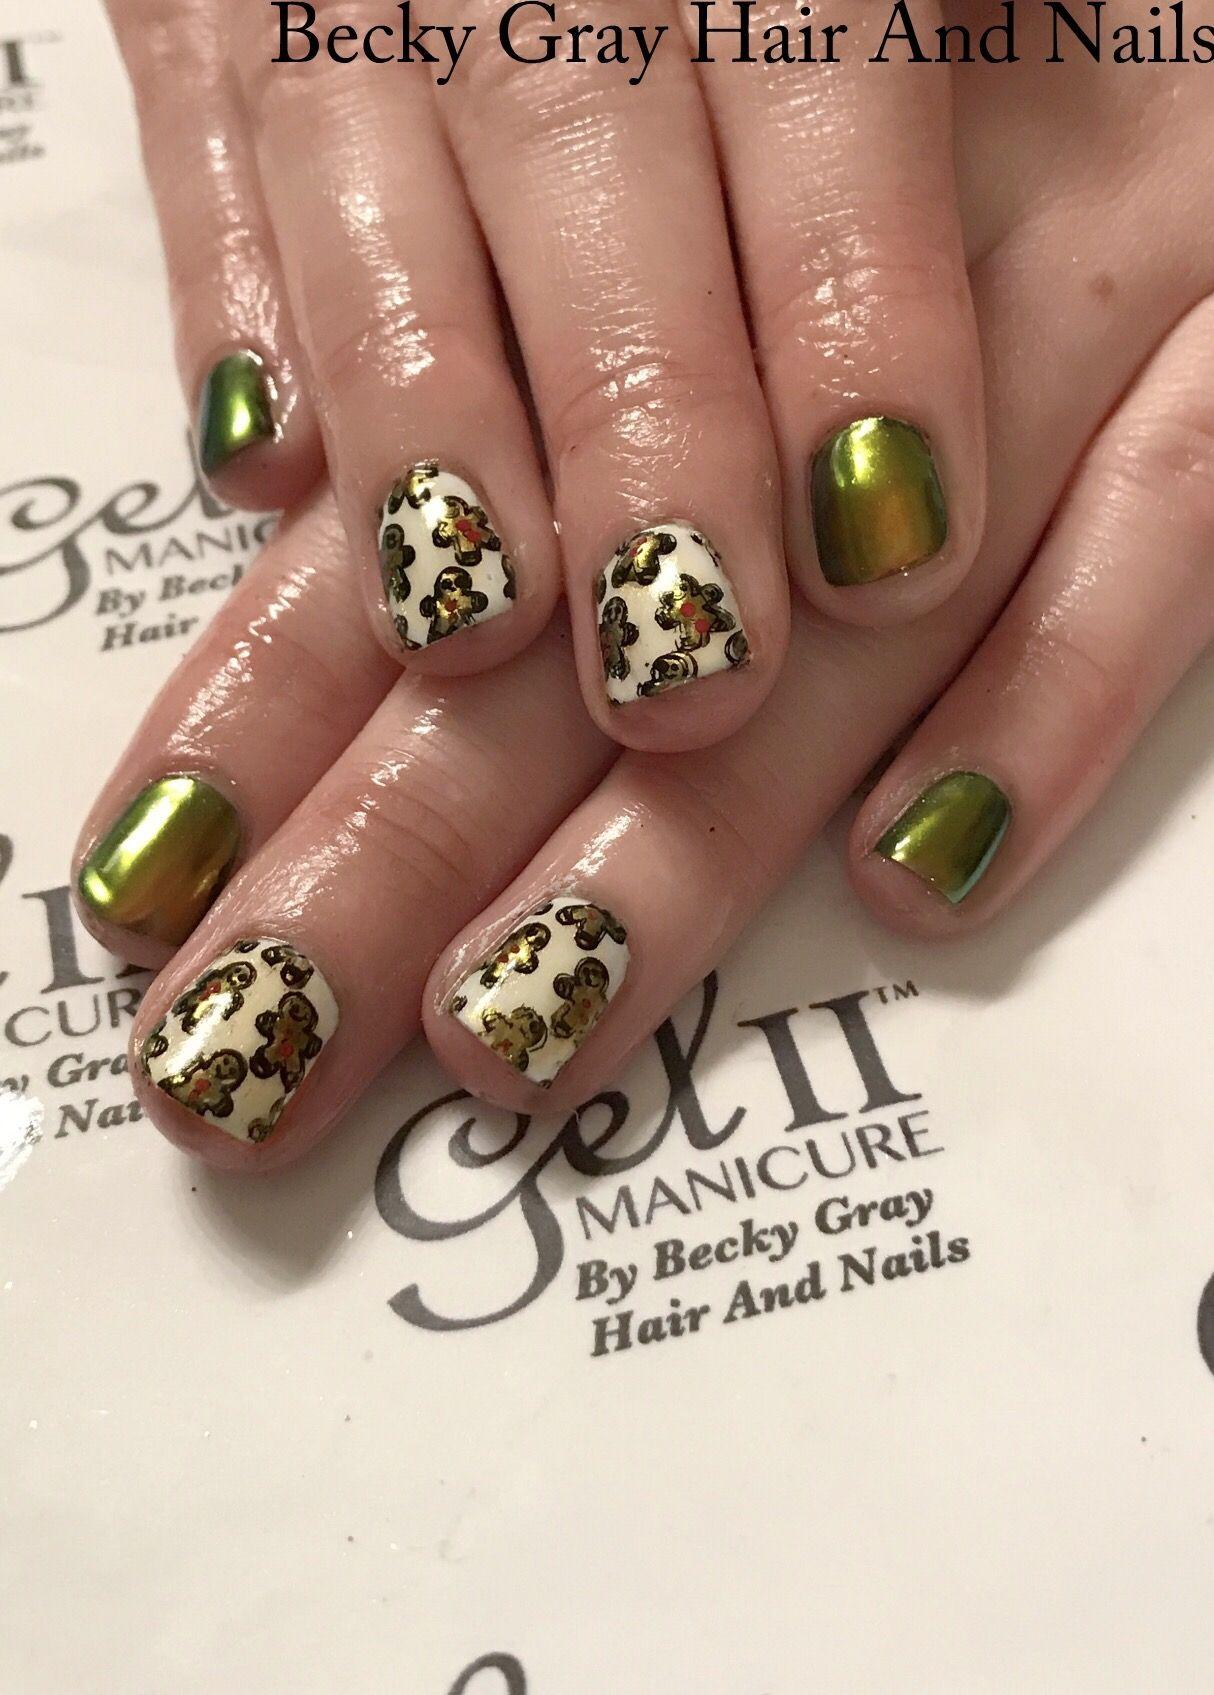 #gelii #manicure #chrome #geliichrome #moyoulondon #nailart #gingerbreadmen #christmas #christmasnails #showscratch #tcbg